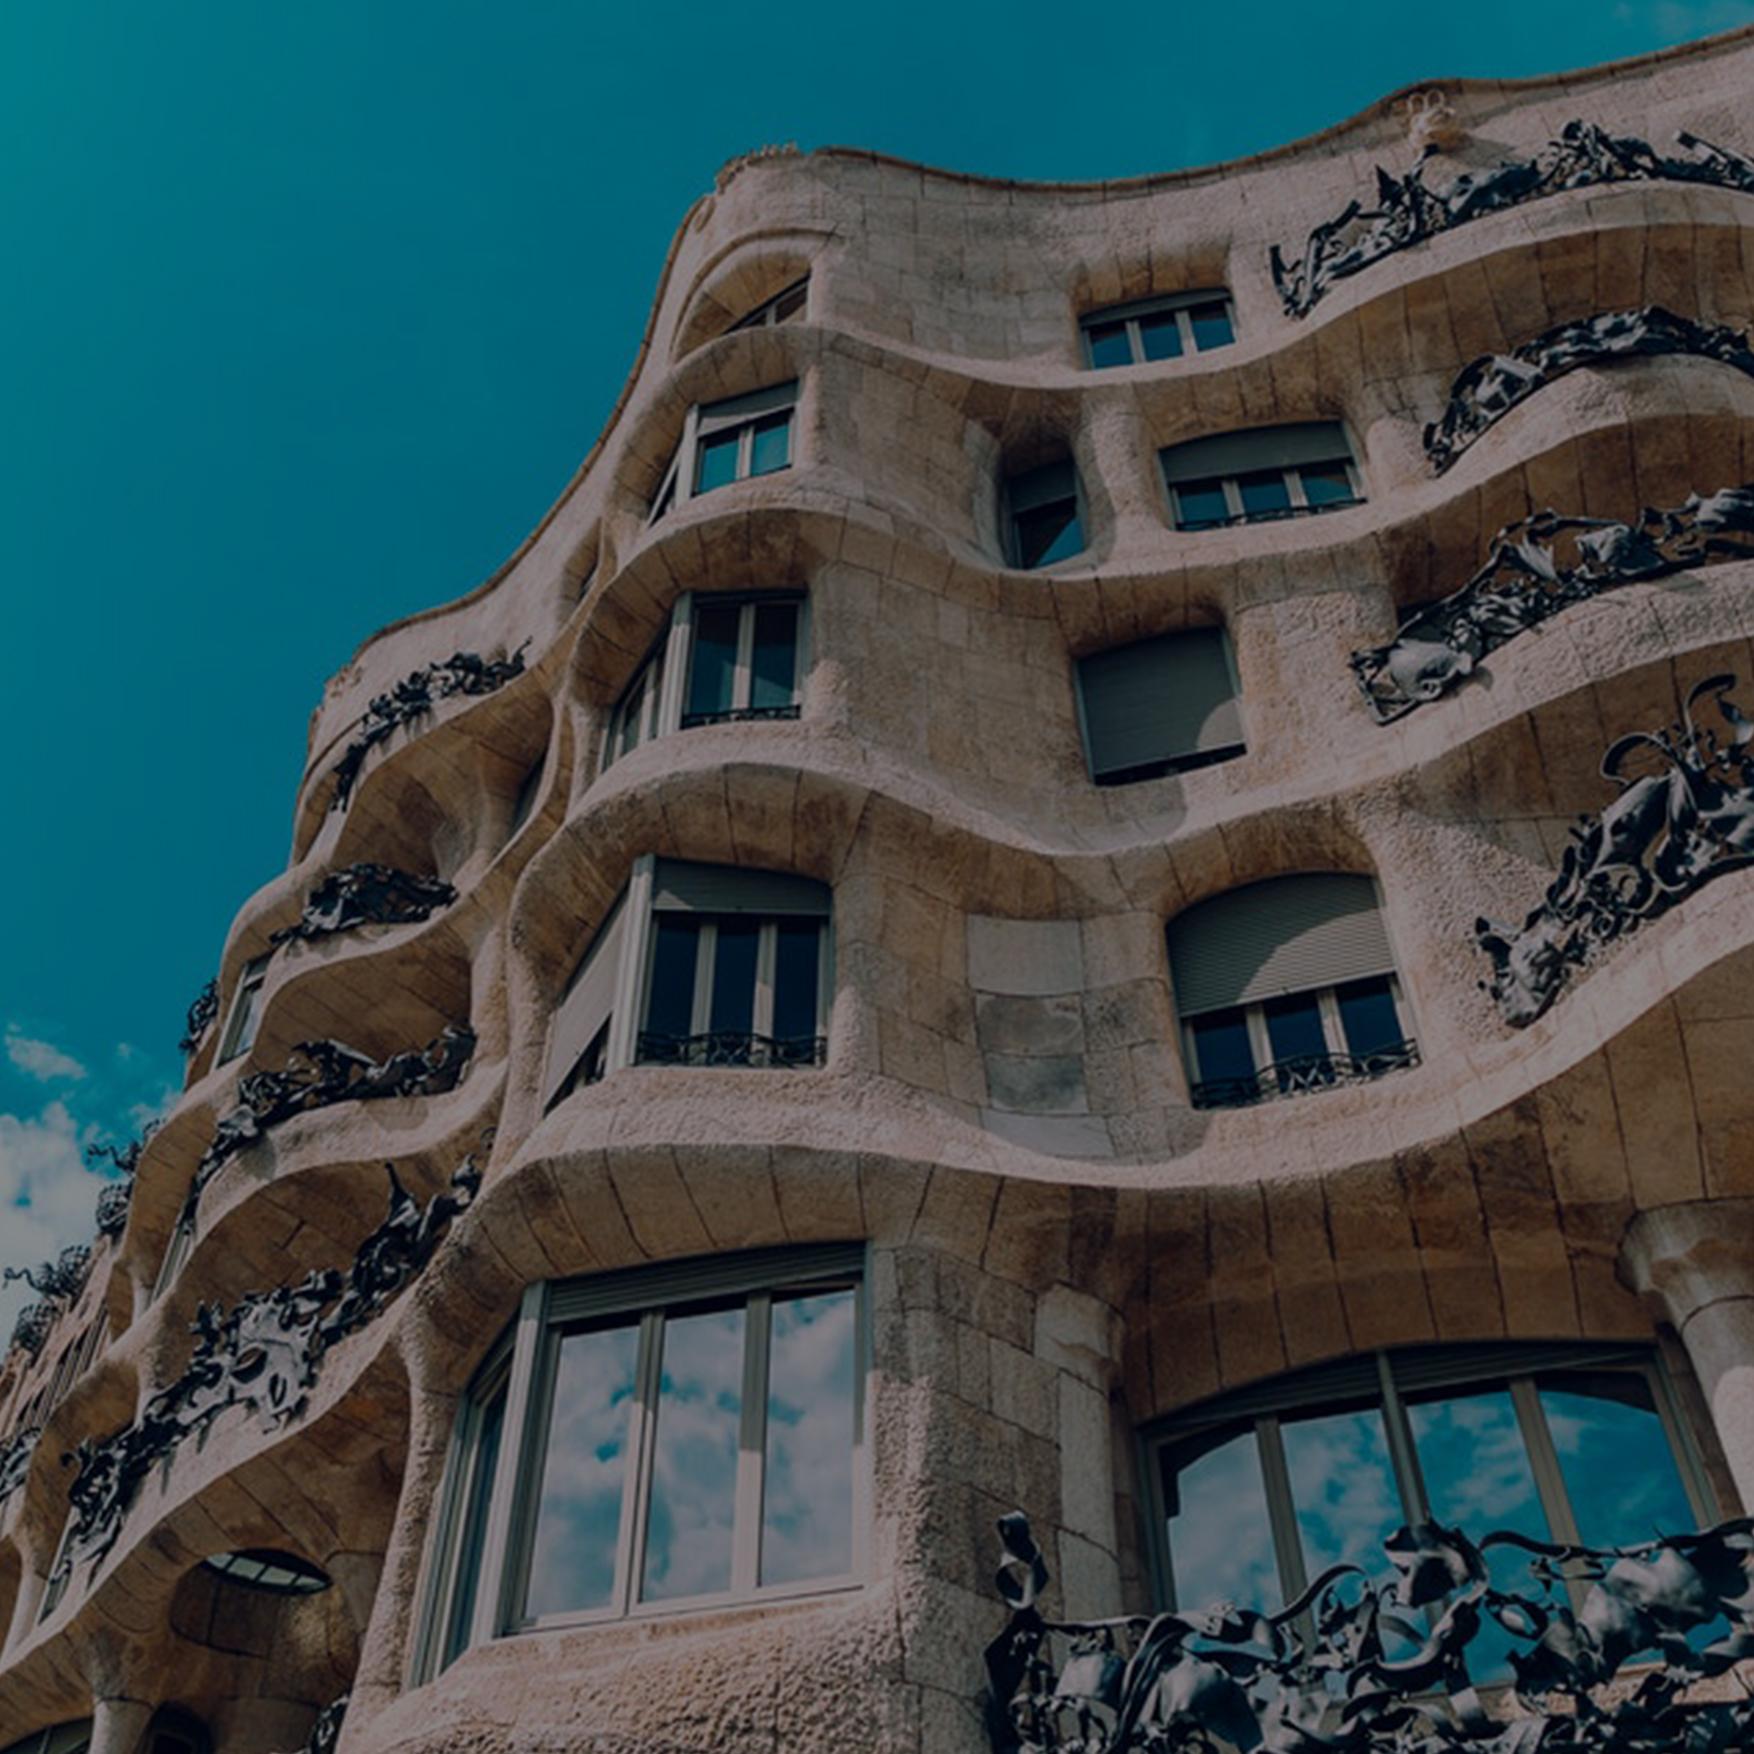 Barcelona - The city of Dreams